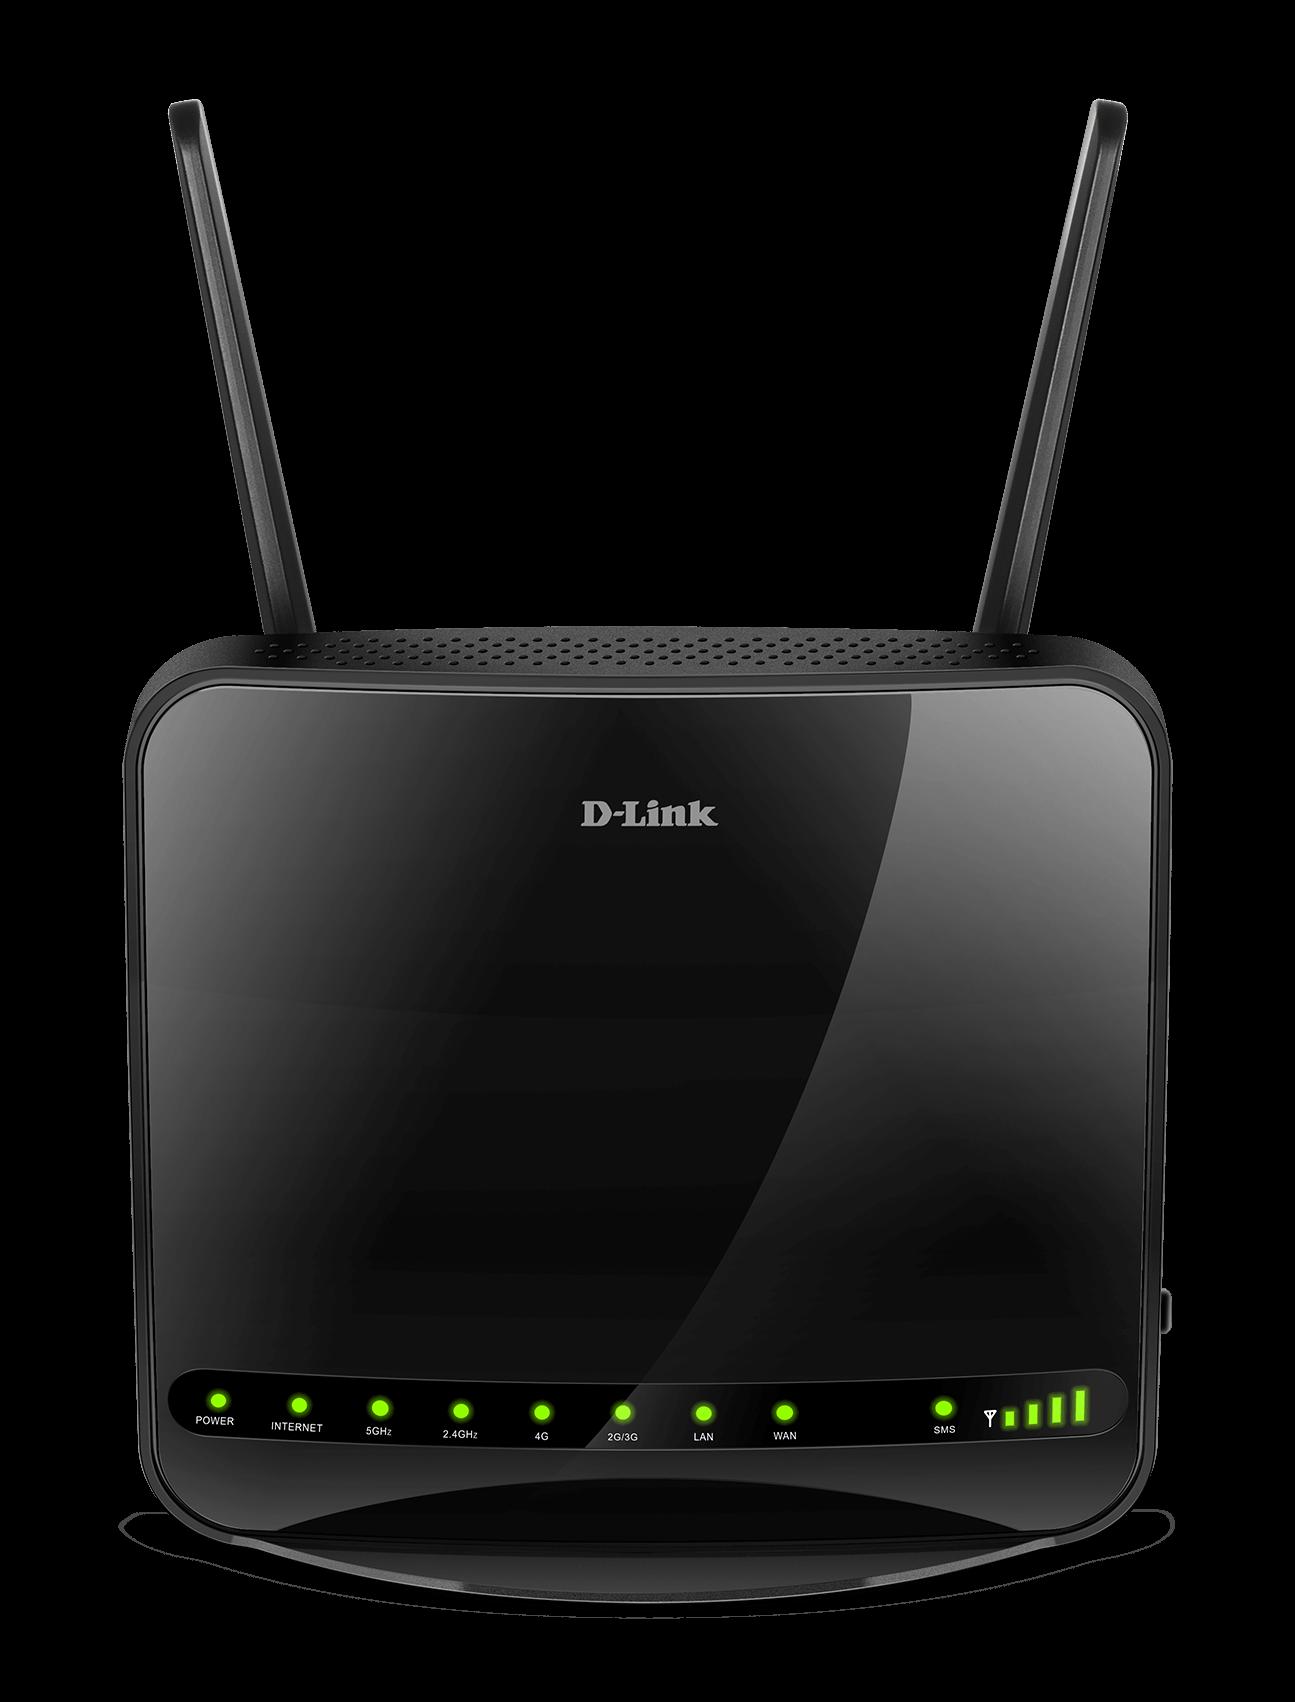 D-Link DWR-953 Wireless AC1200 4G LTE Gigabit router - DWR-953